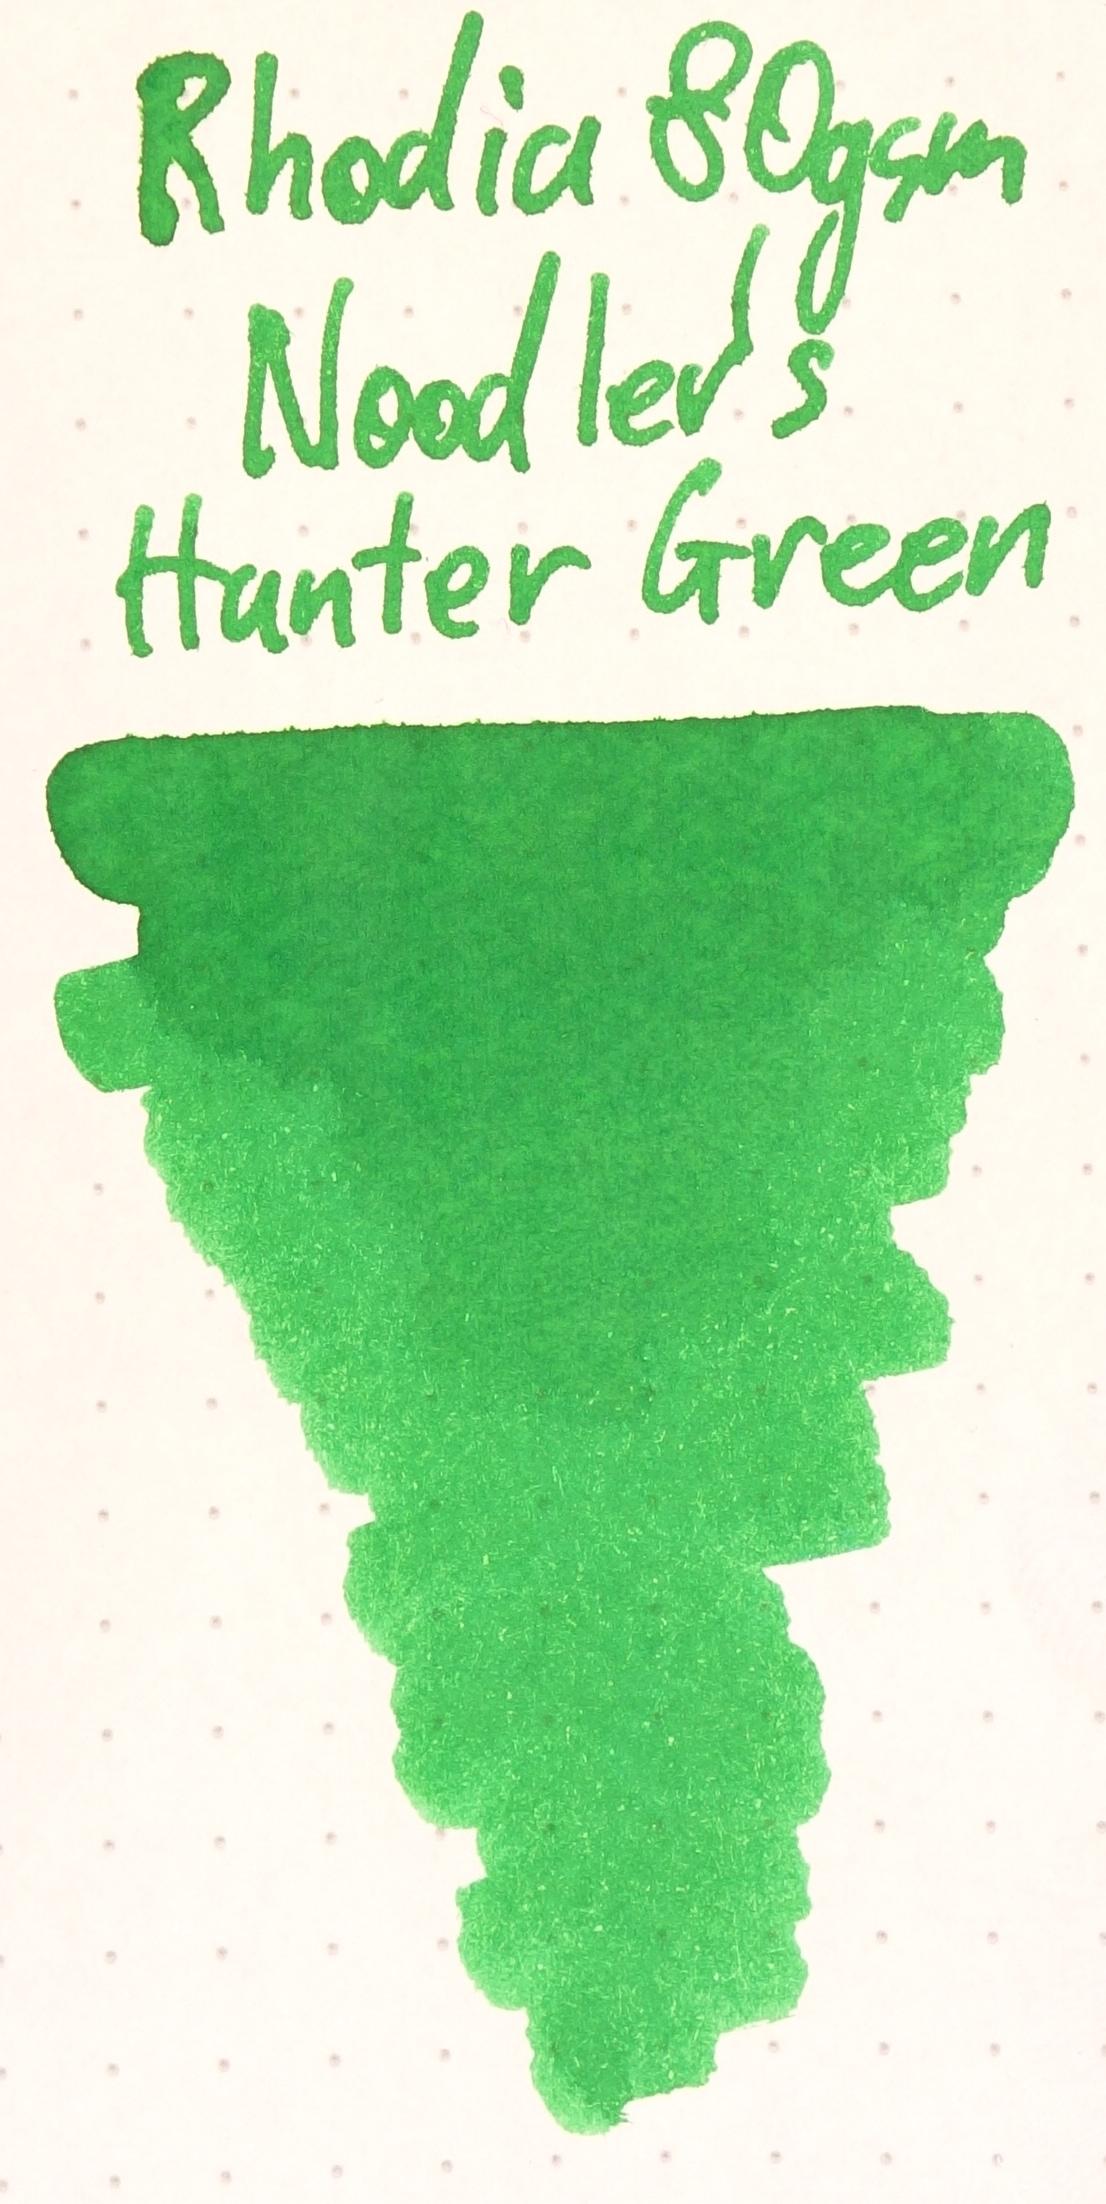 Noodler's Hunter Green Rhodia.JPG